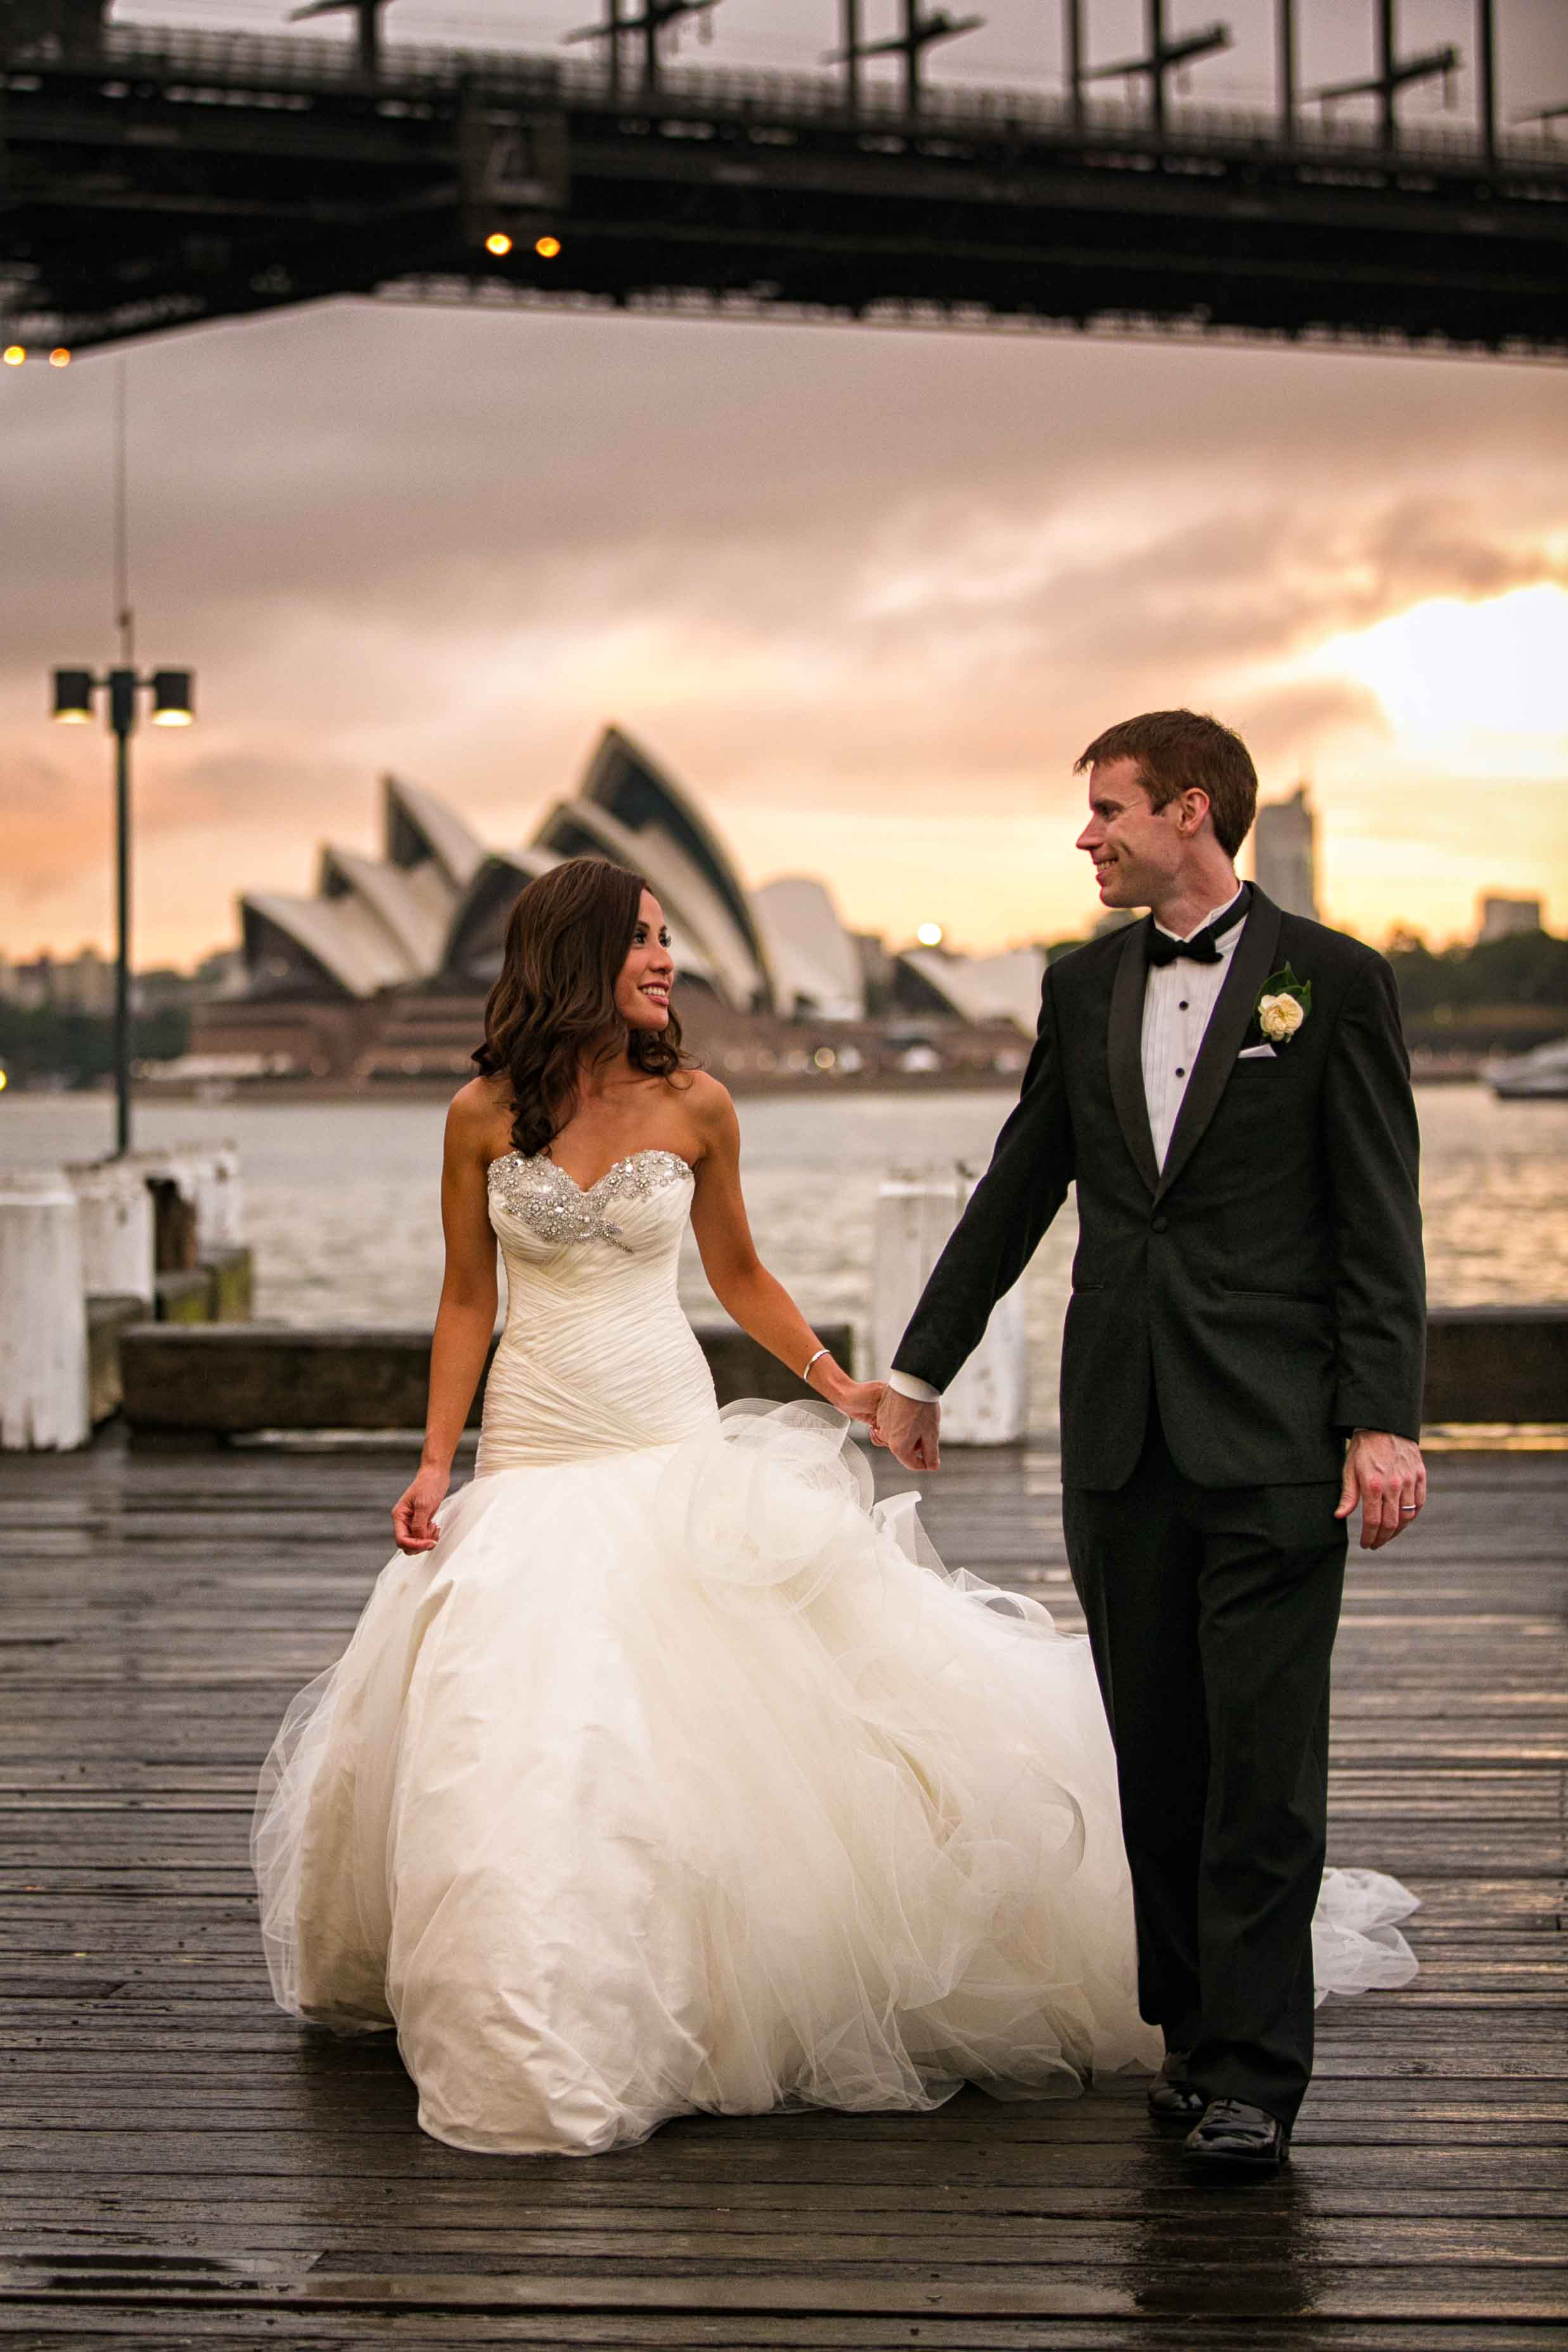 Eva and Diarmuid wedding Luna Park Sydney